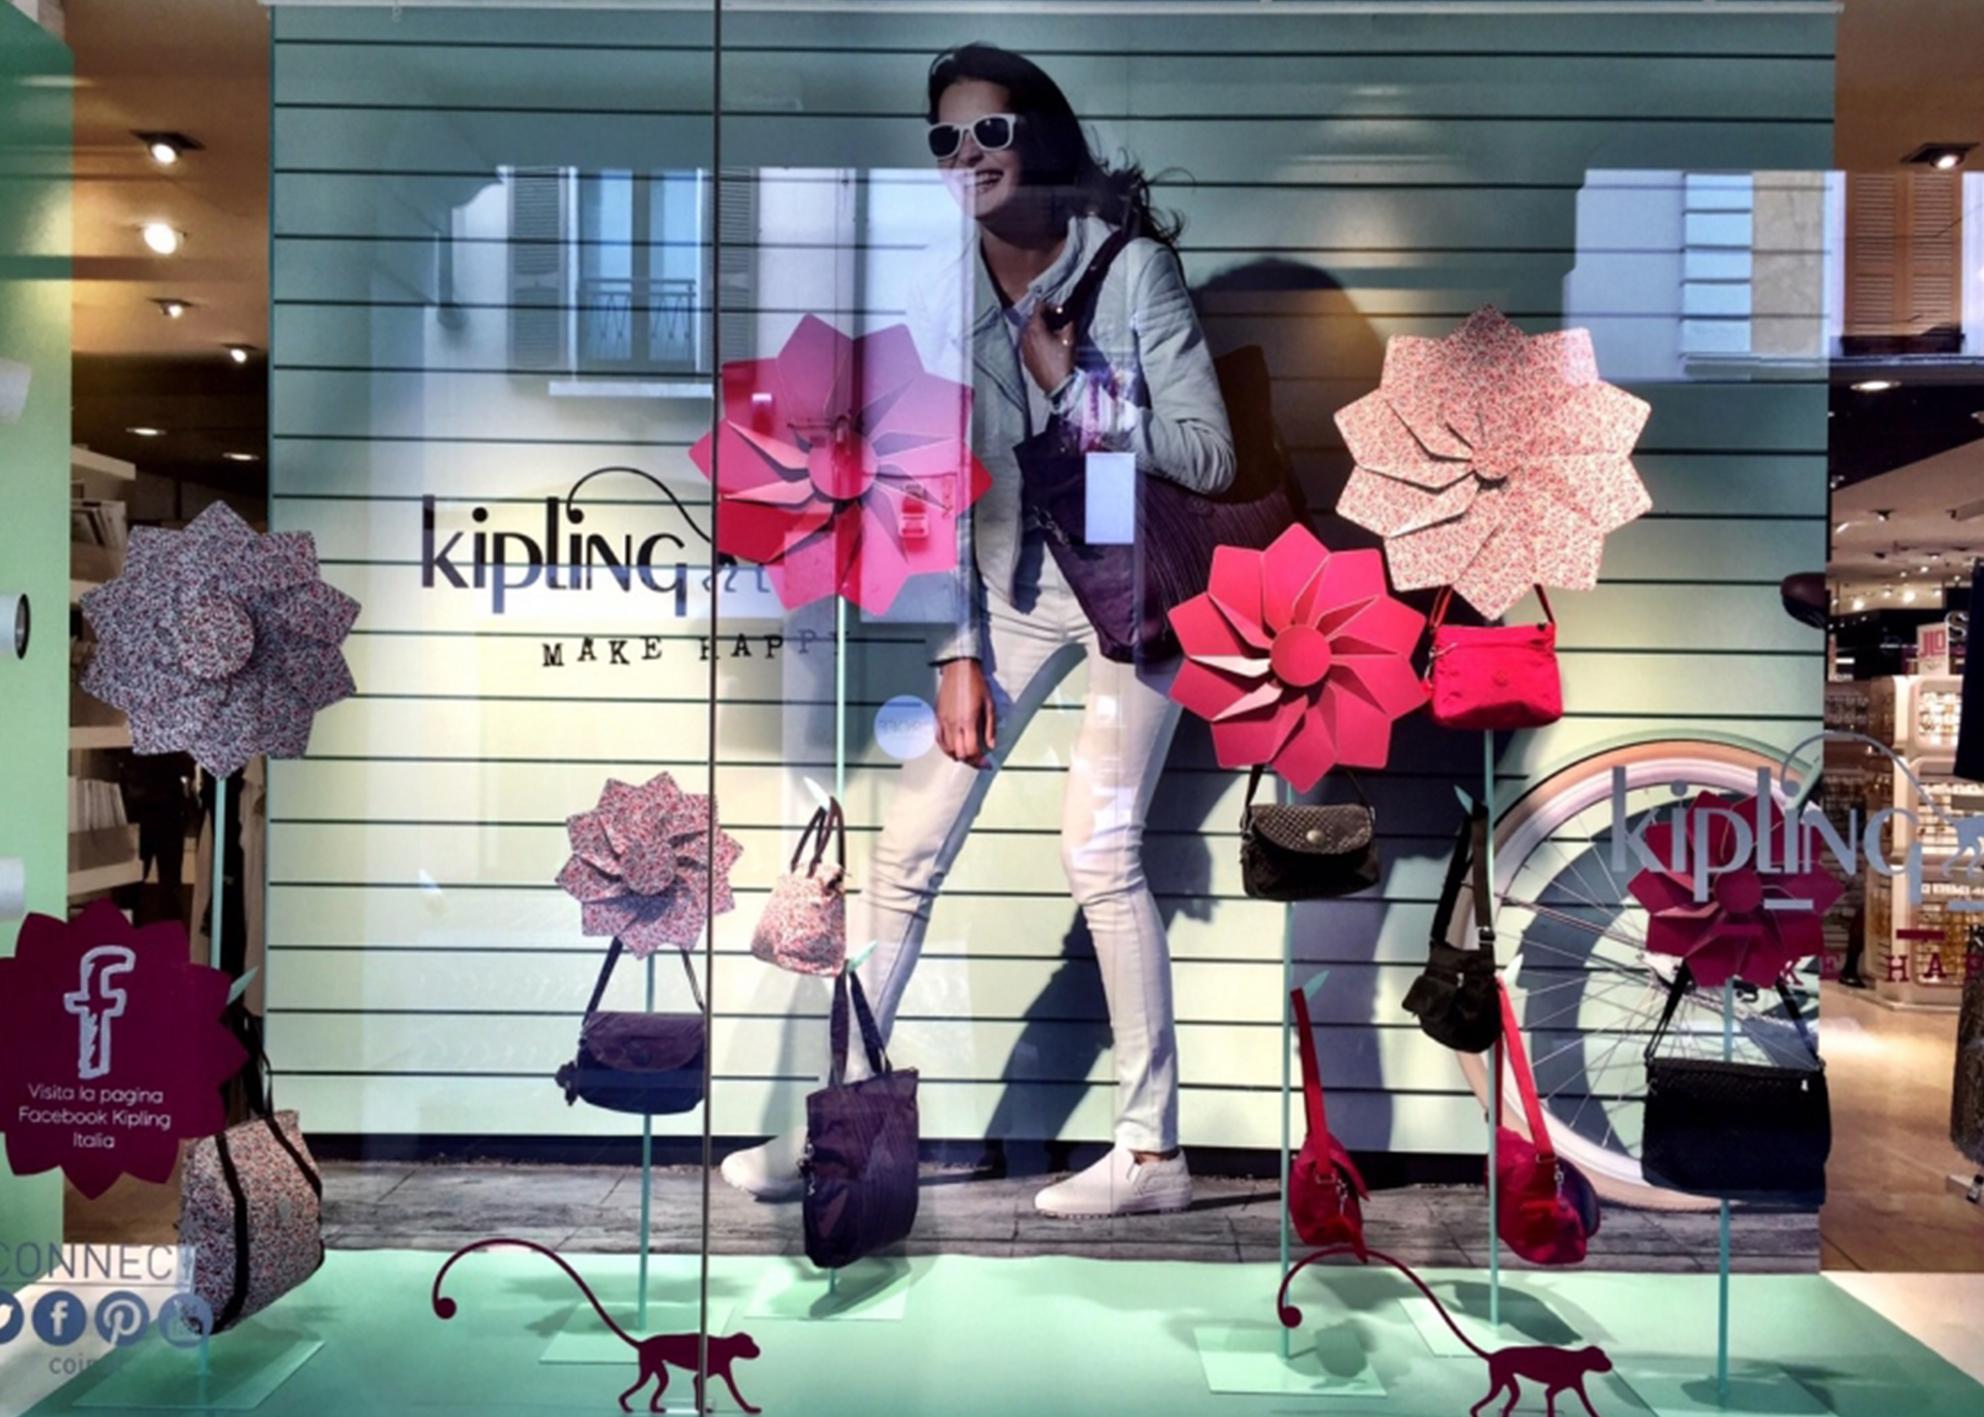 Immagine Sito Kipling 01